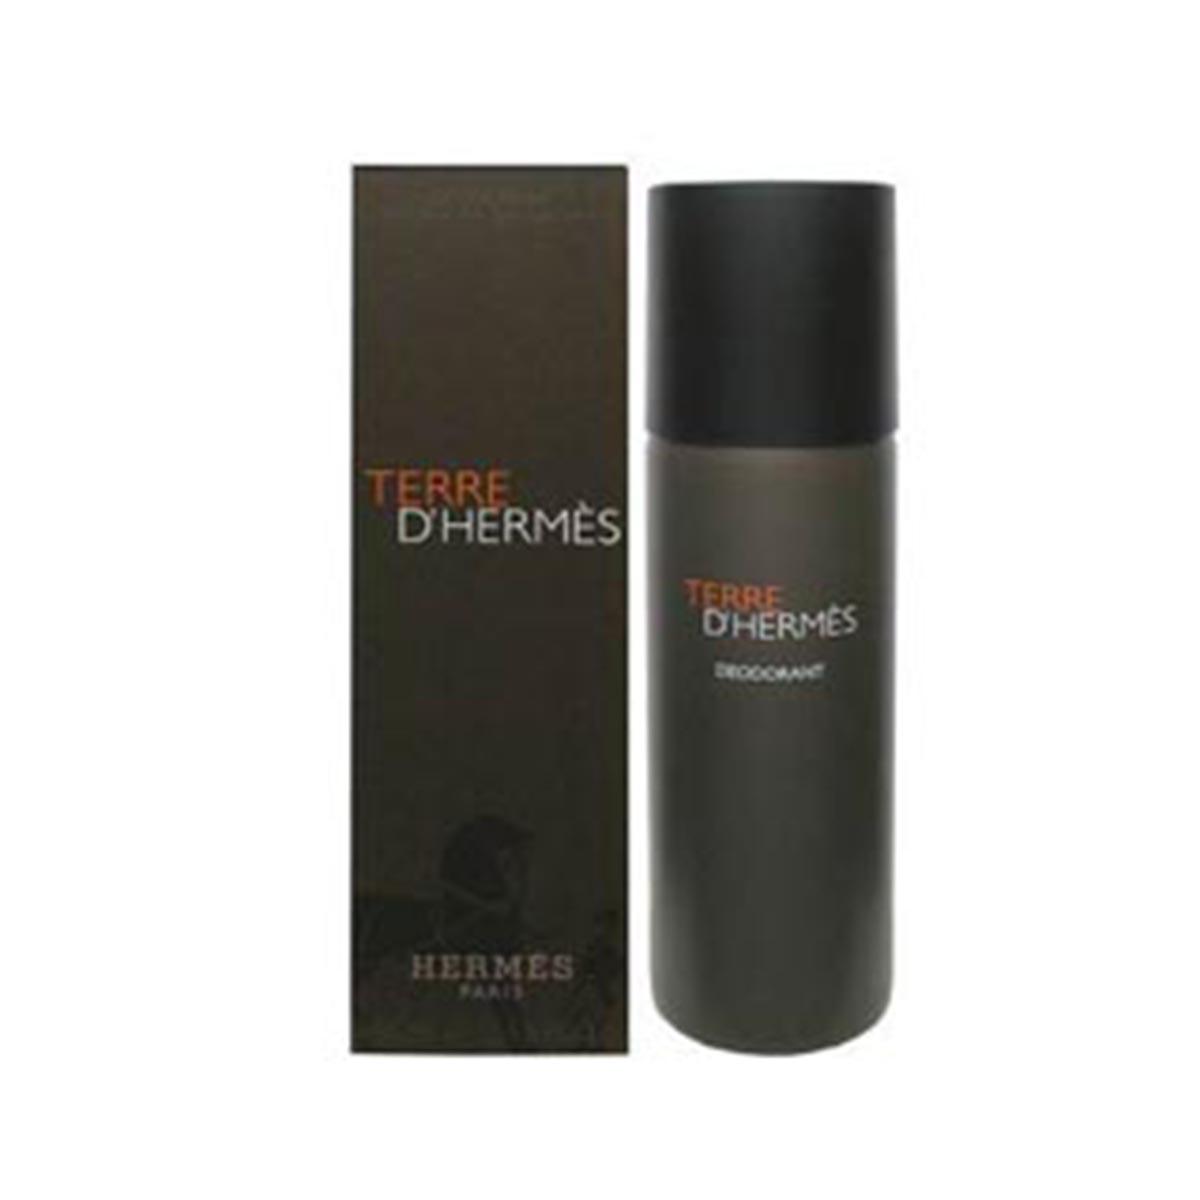 Hermes terre d hermes desodorante 150ml vaporizador